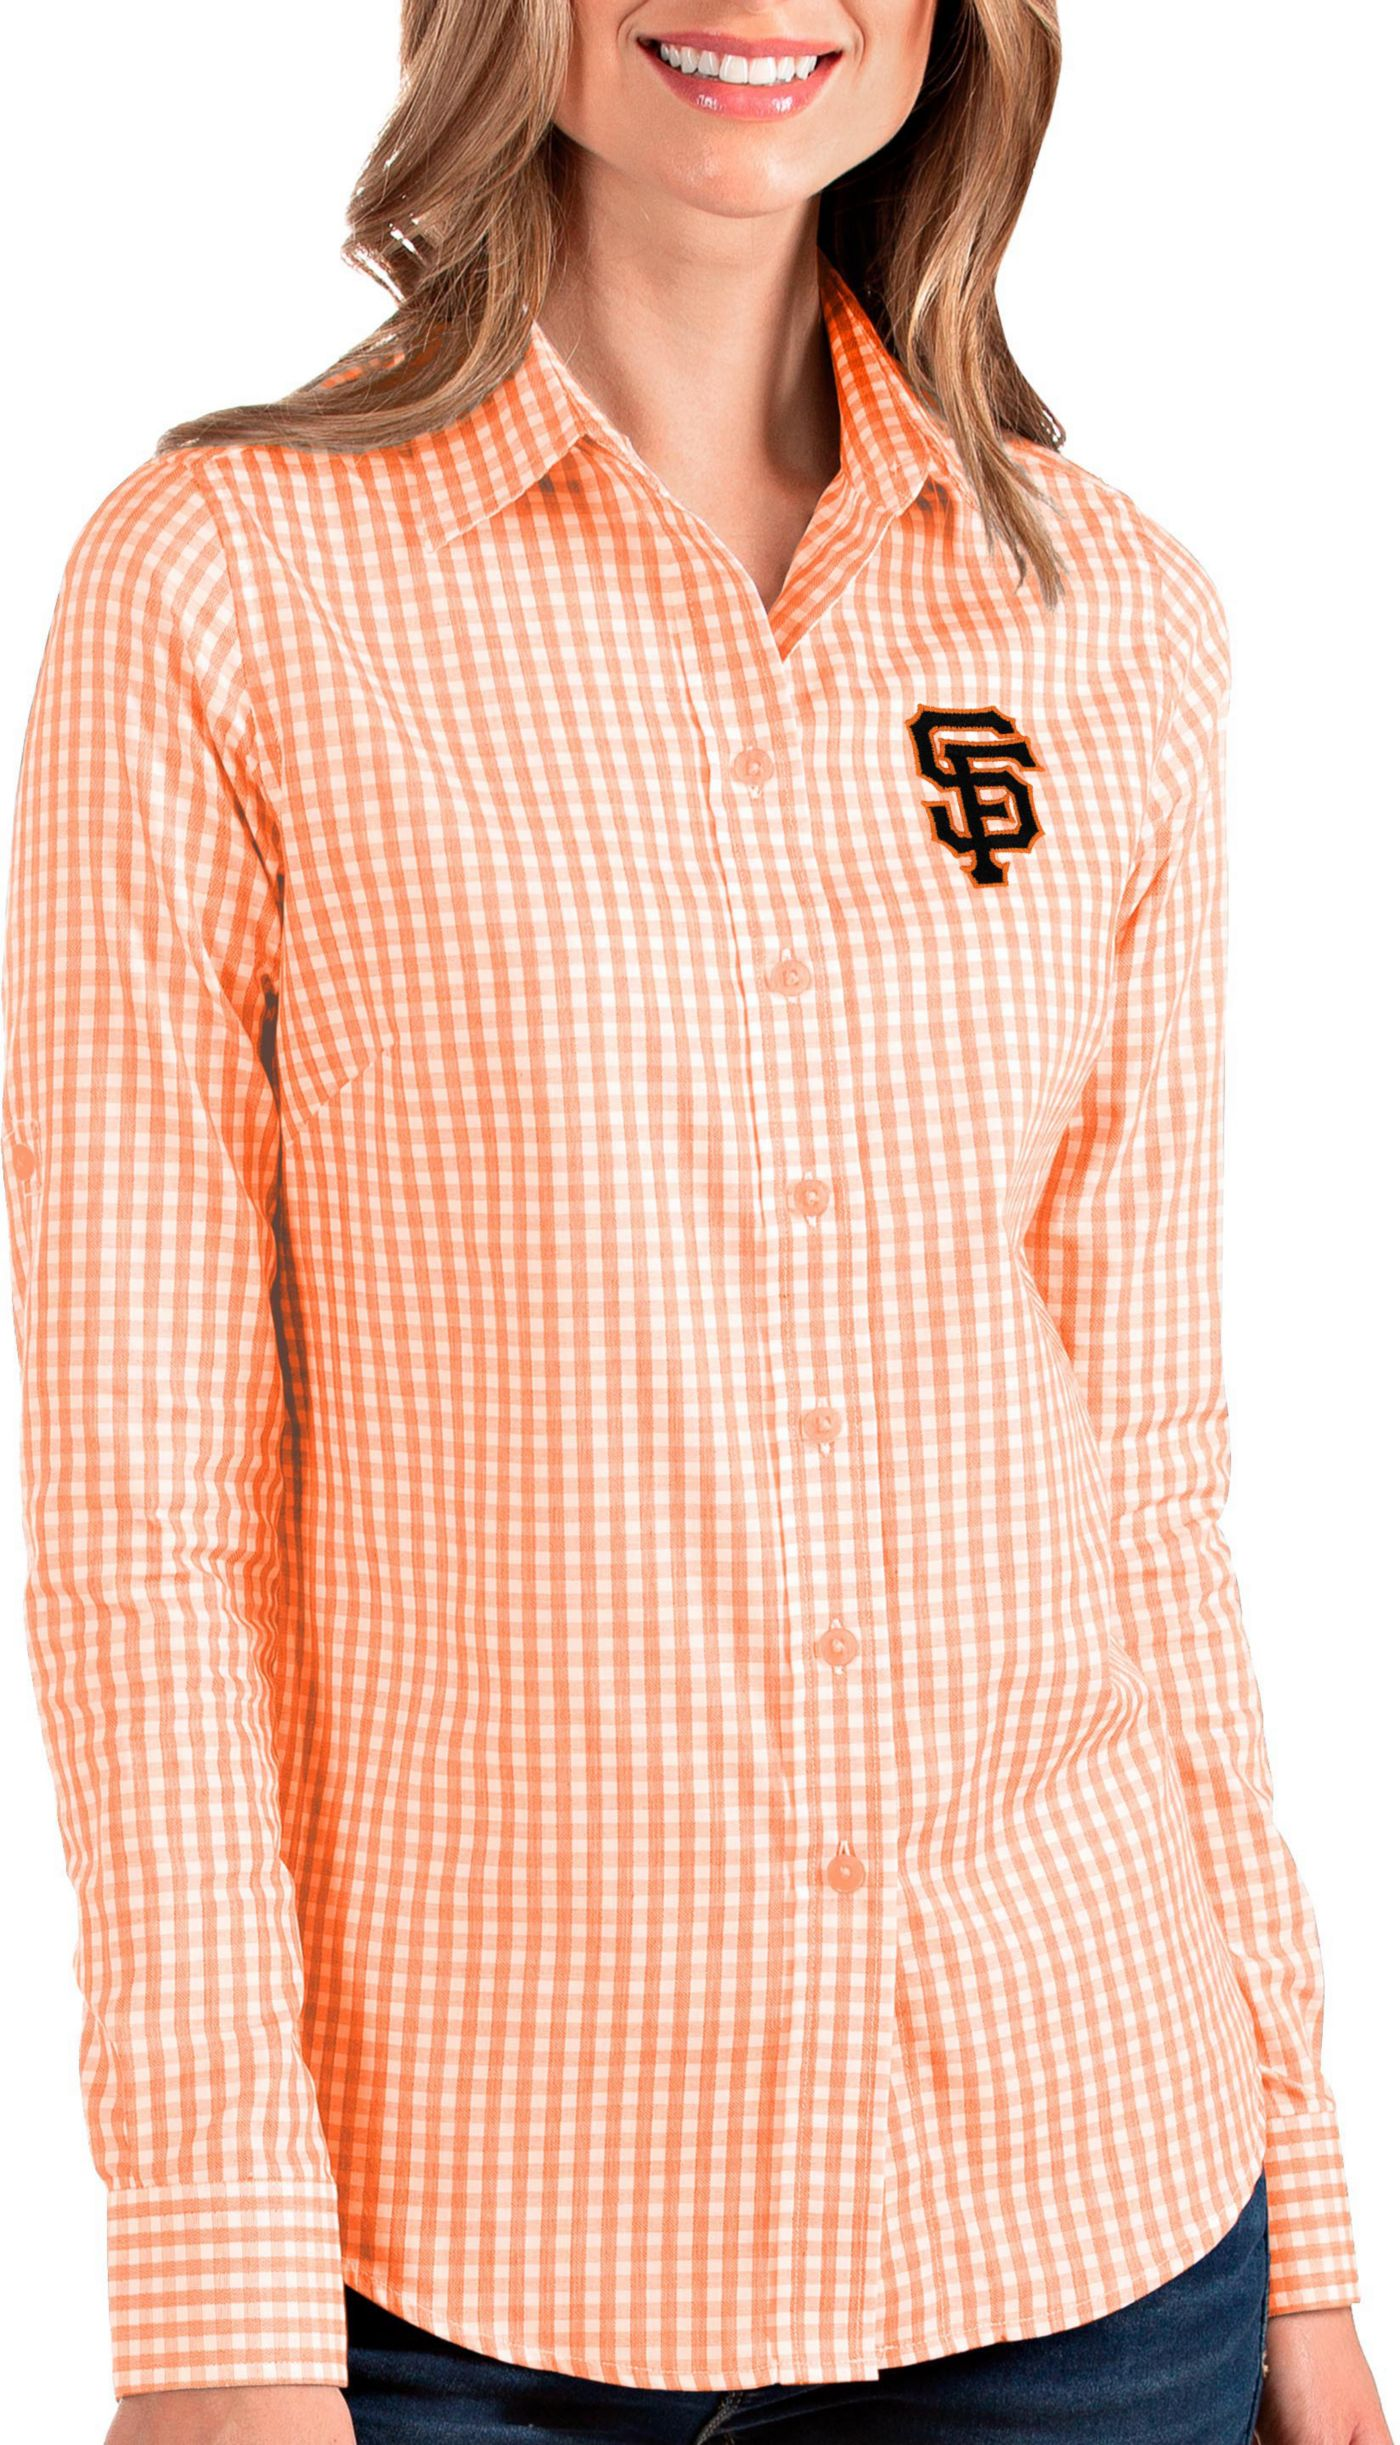 Antigua Women's San Francisco Giants Structure Button-Up Orange Long Sleeve Shirt